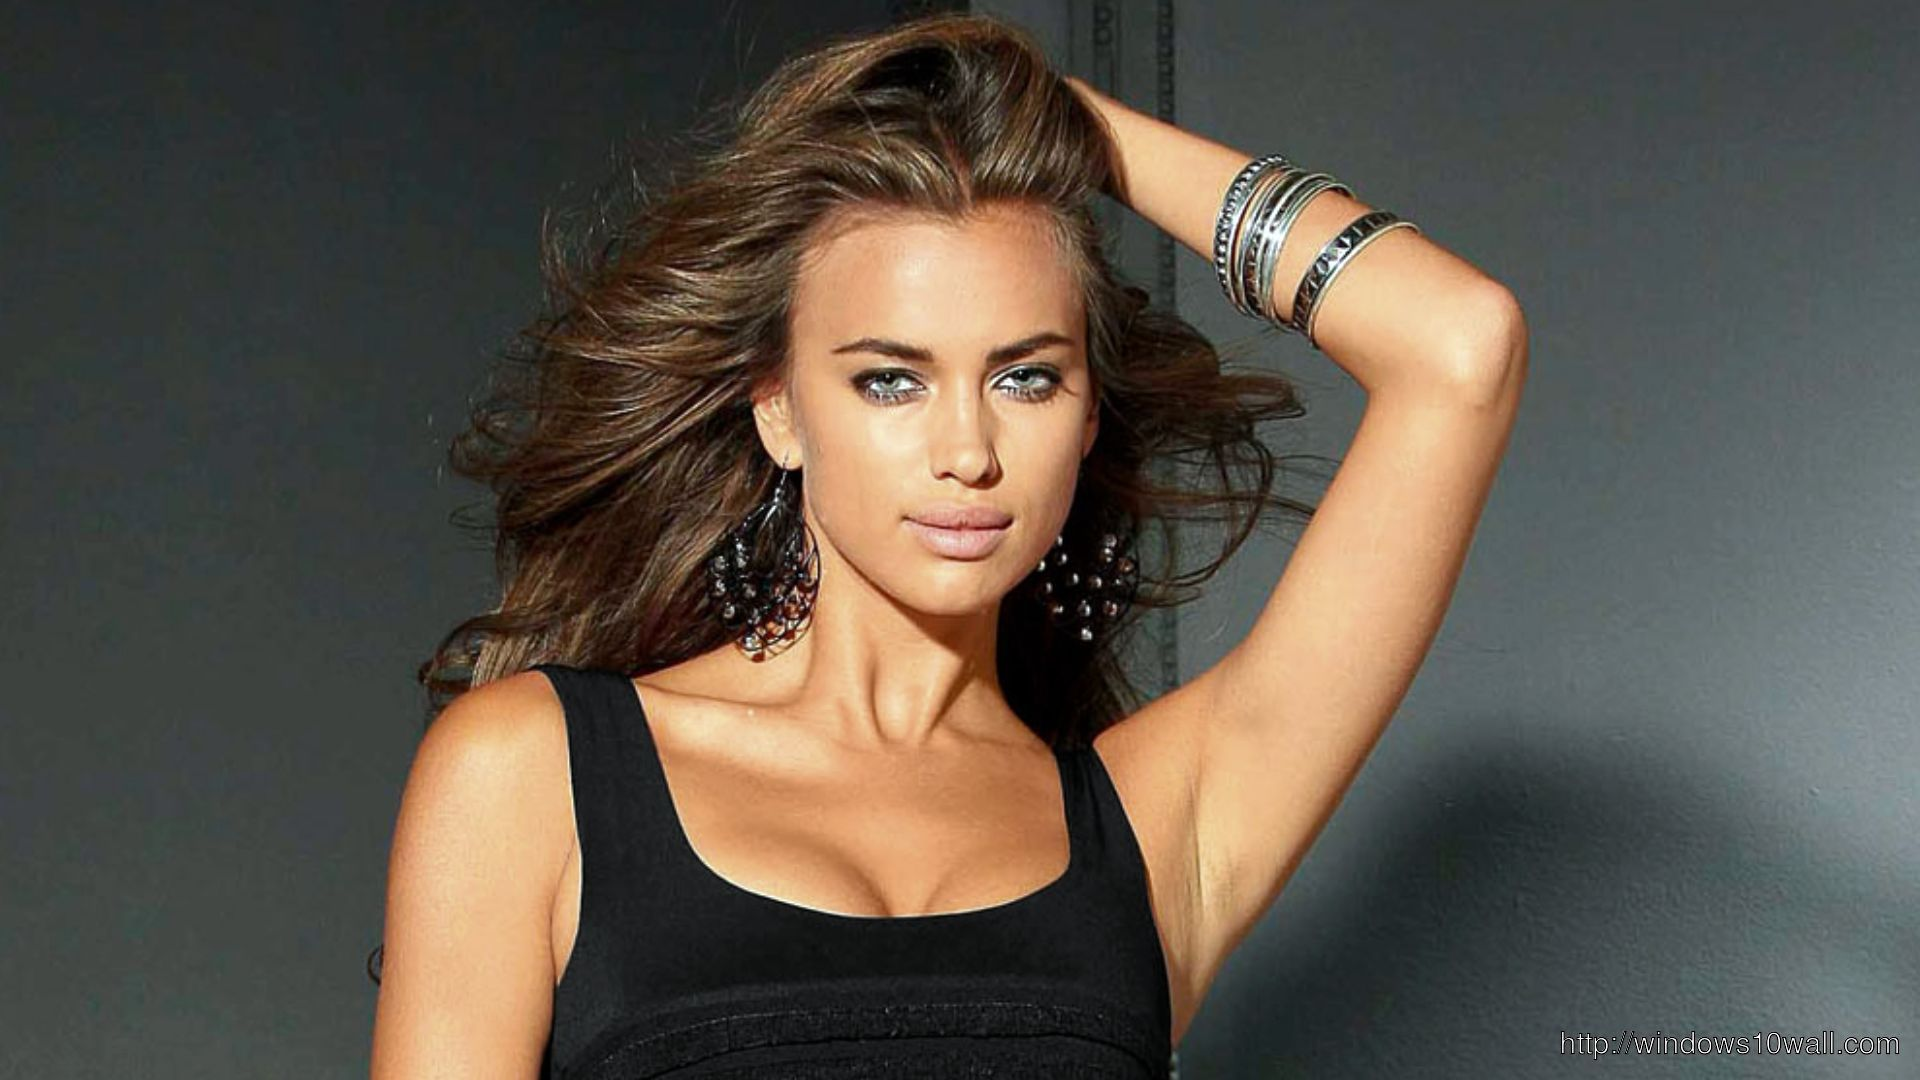 Irina Shayk Gorgeous Background Pic